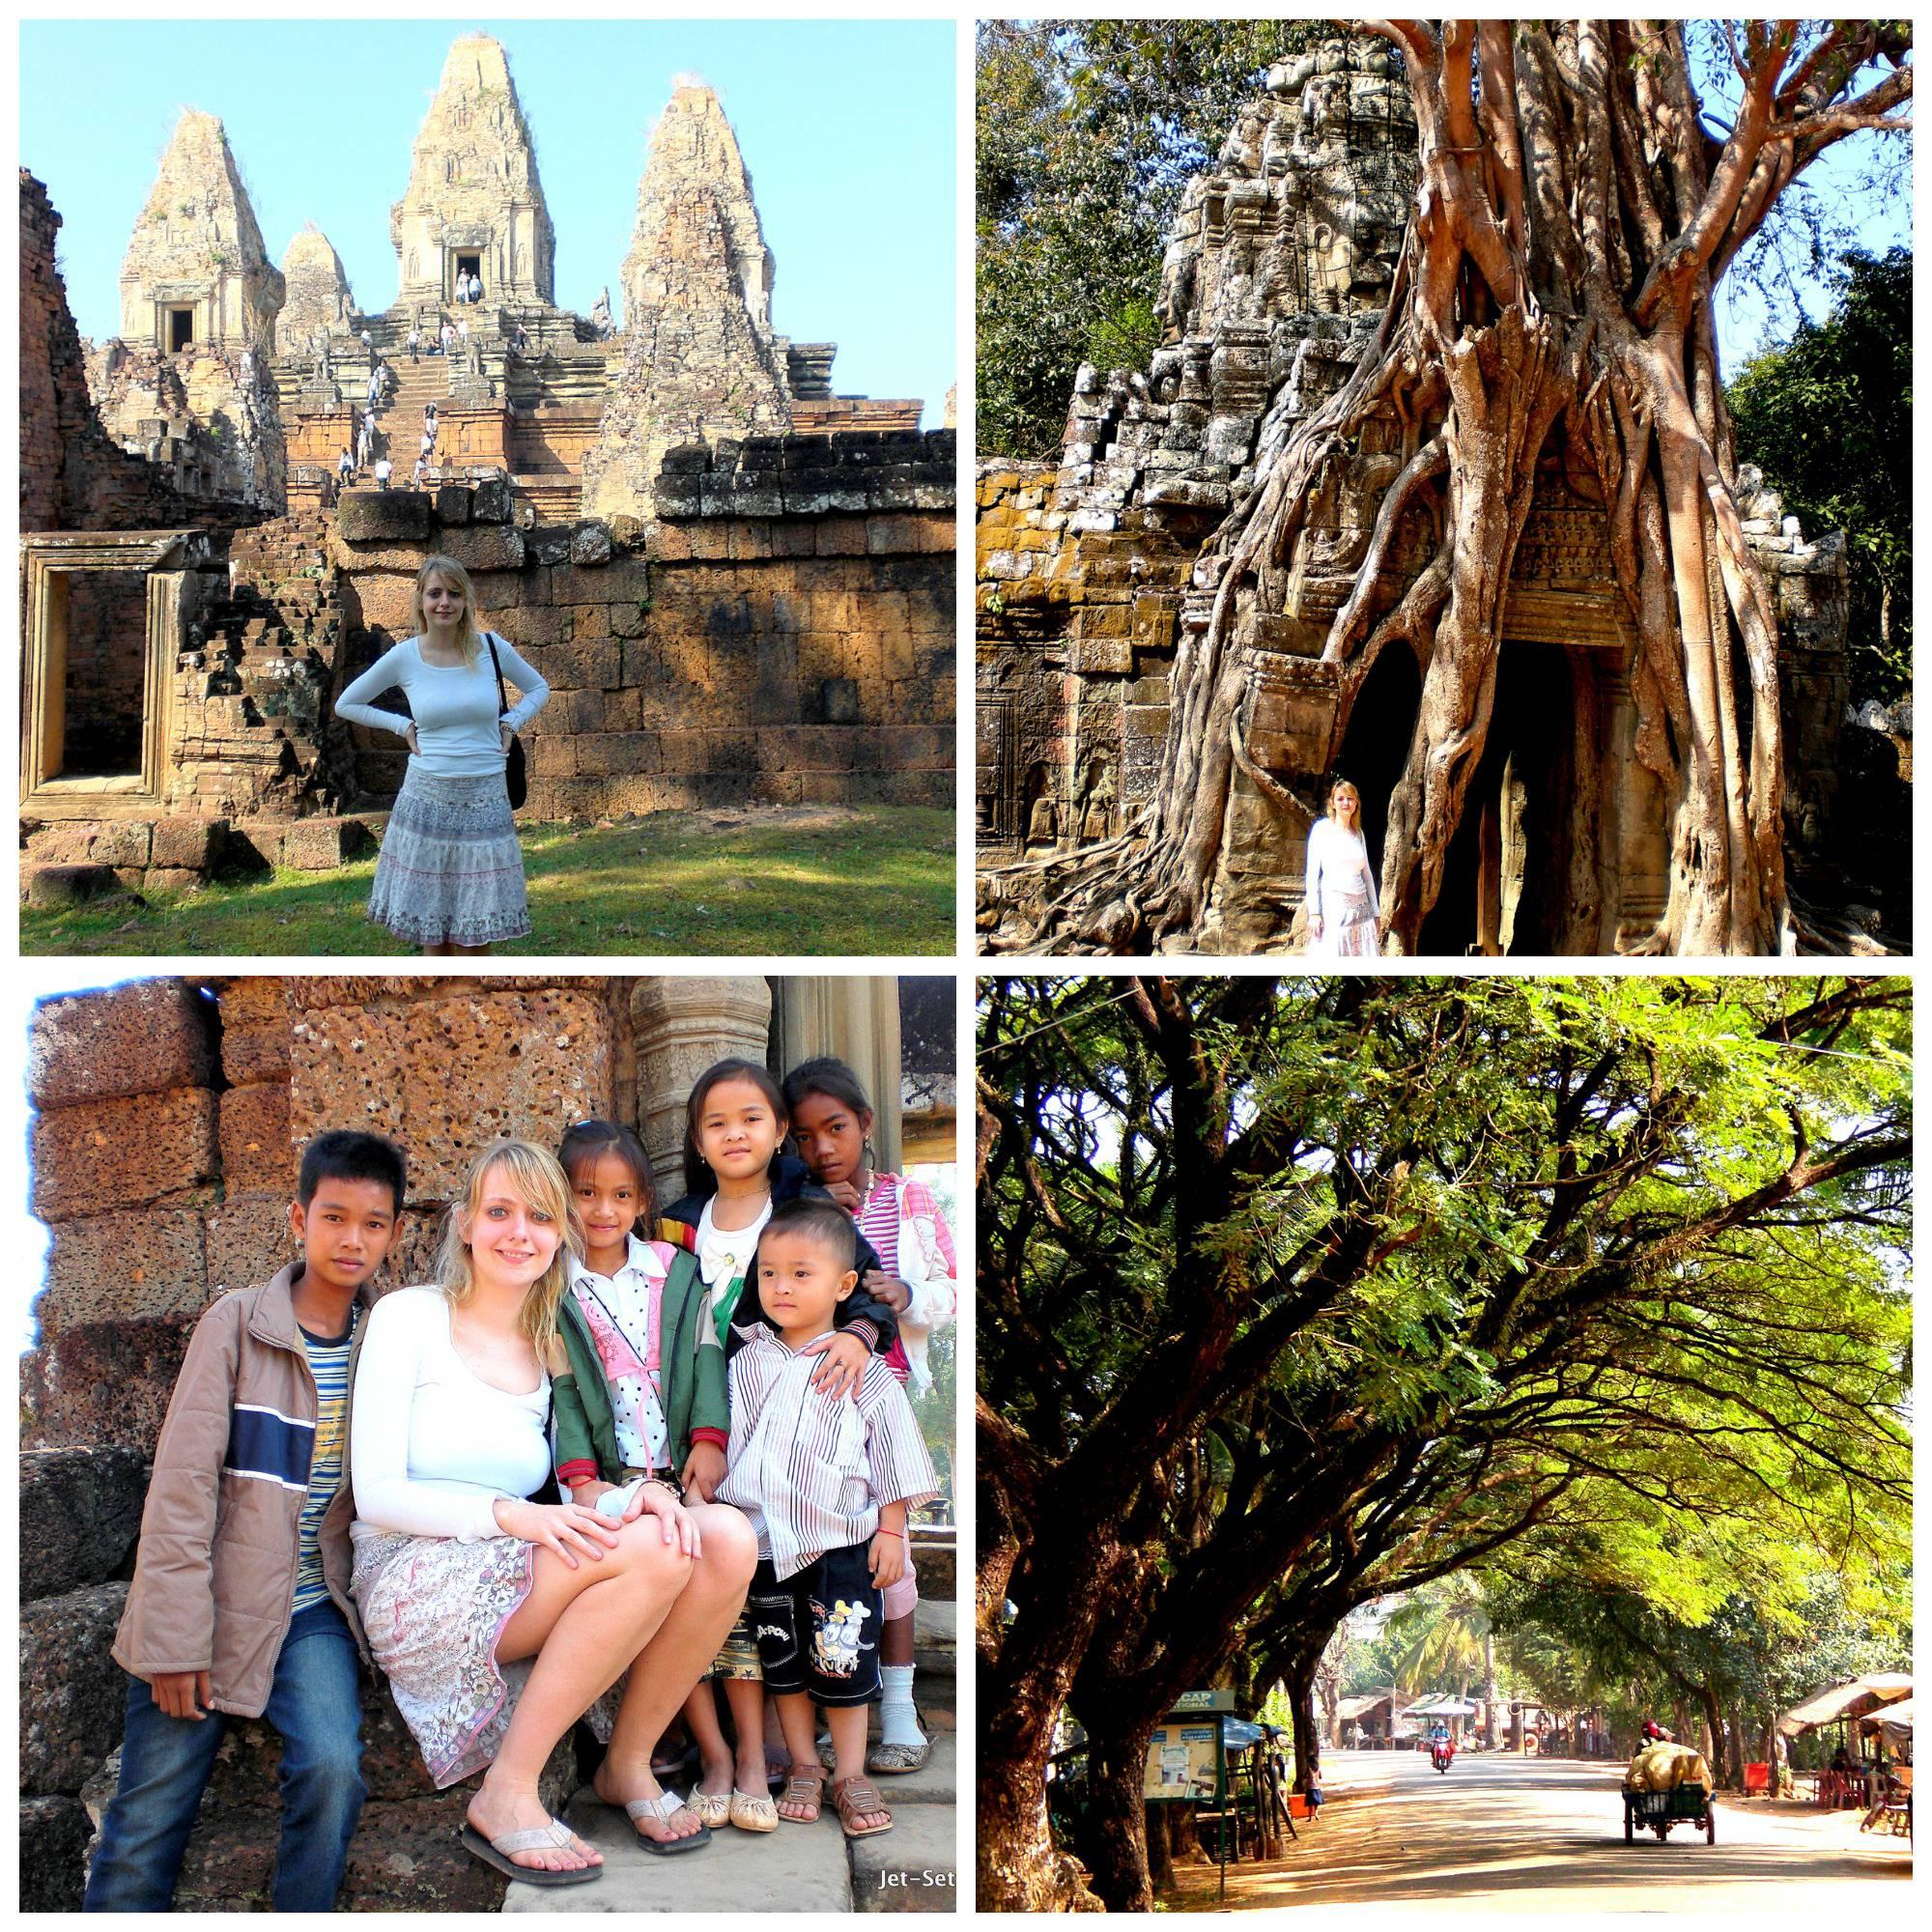 Exploring Angkor Wat in Cambodia